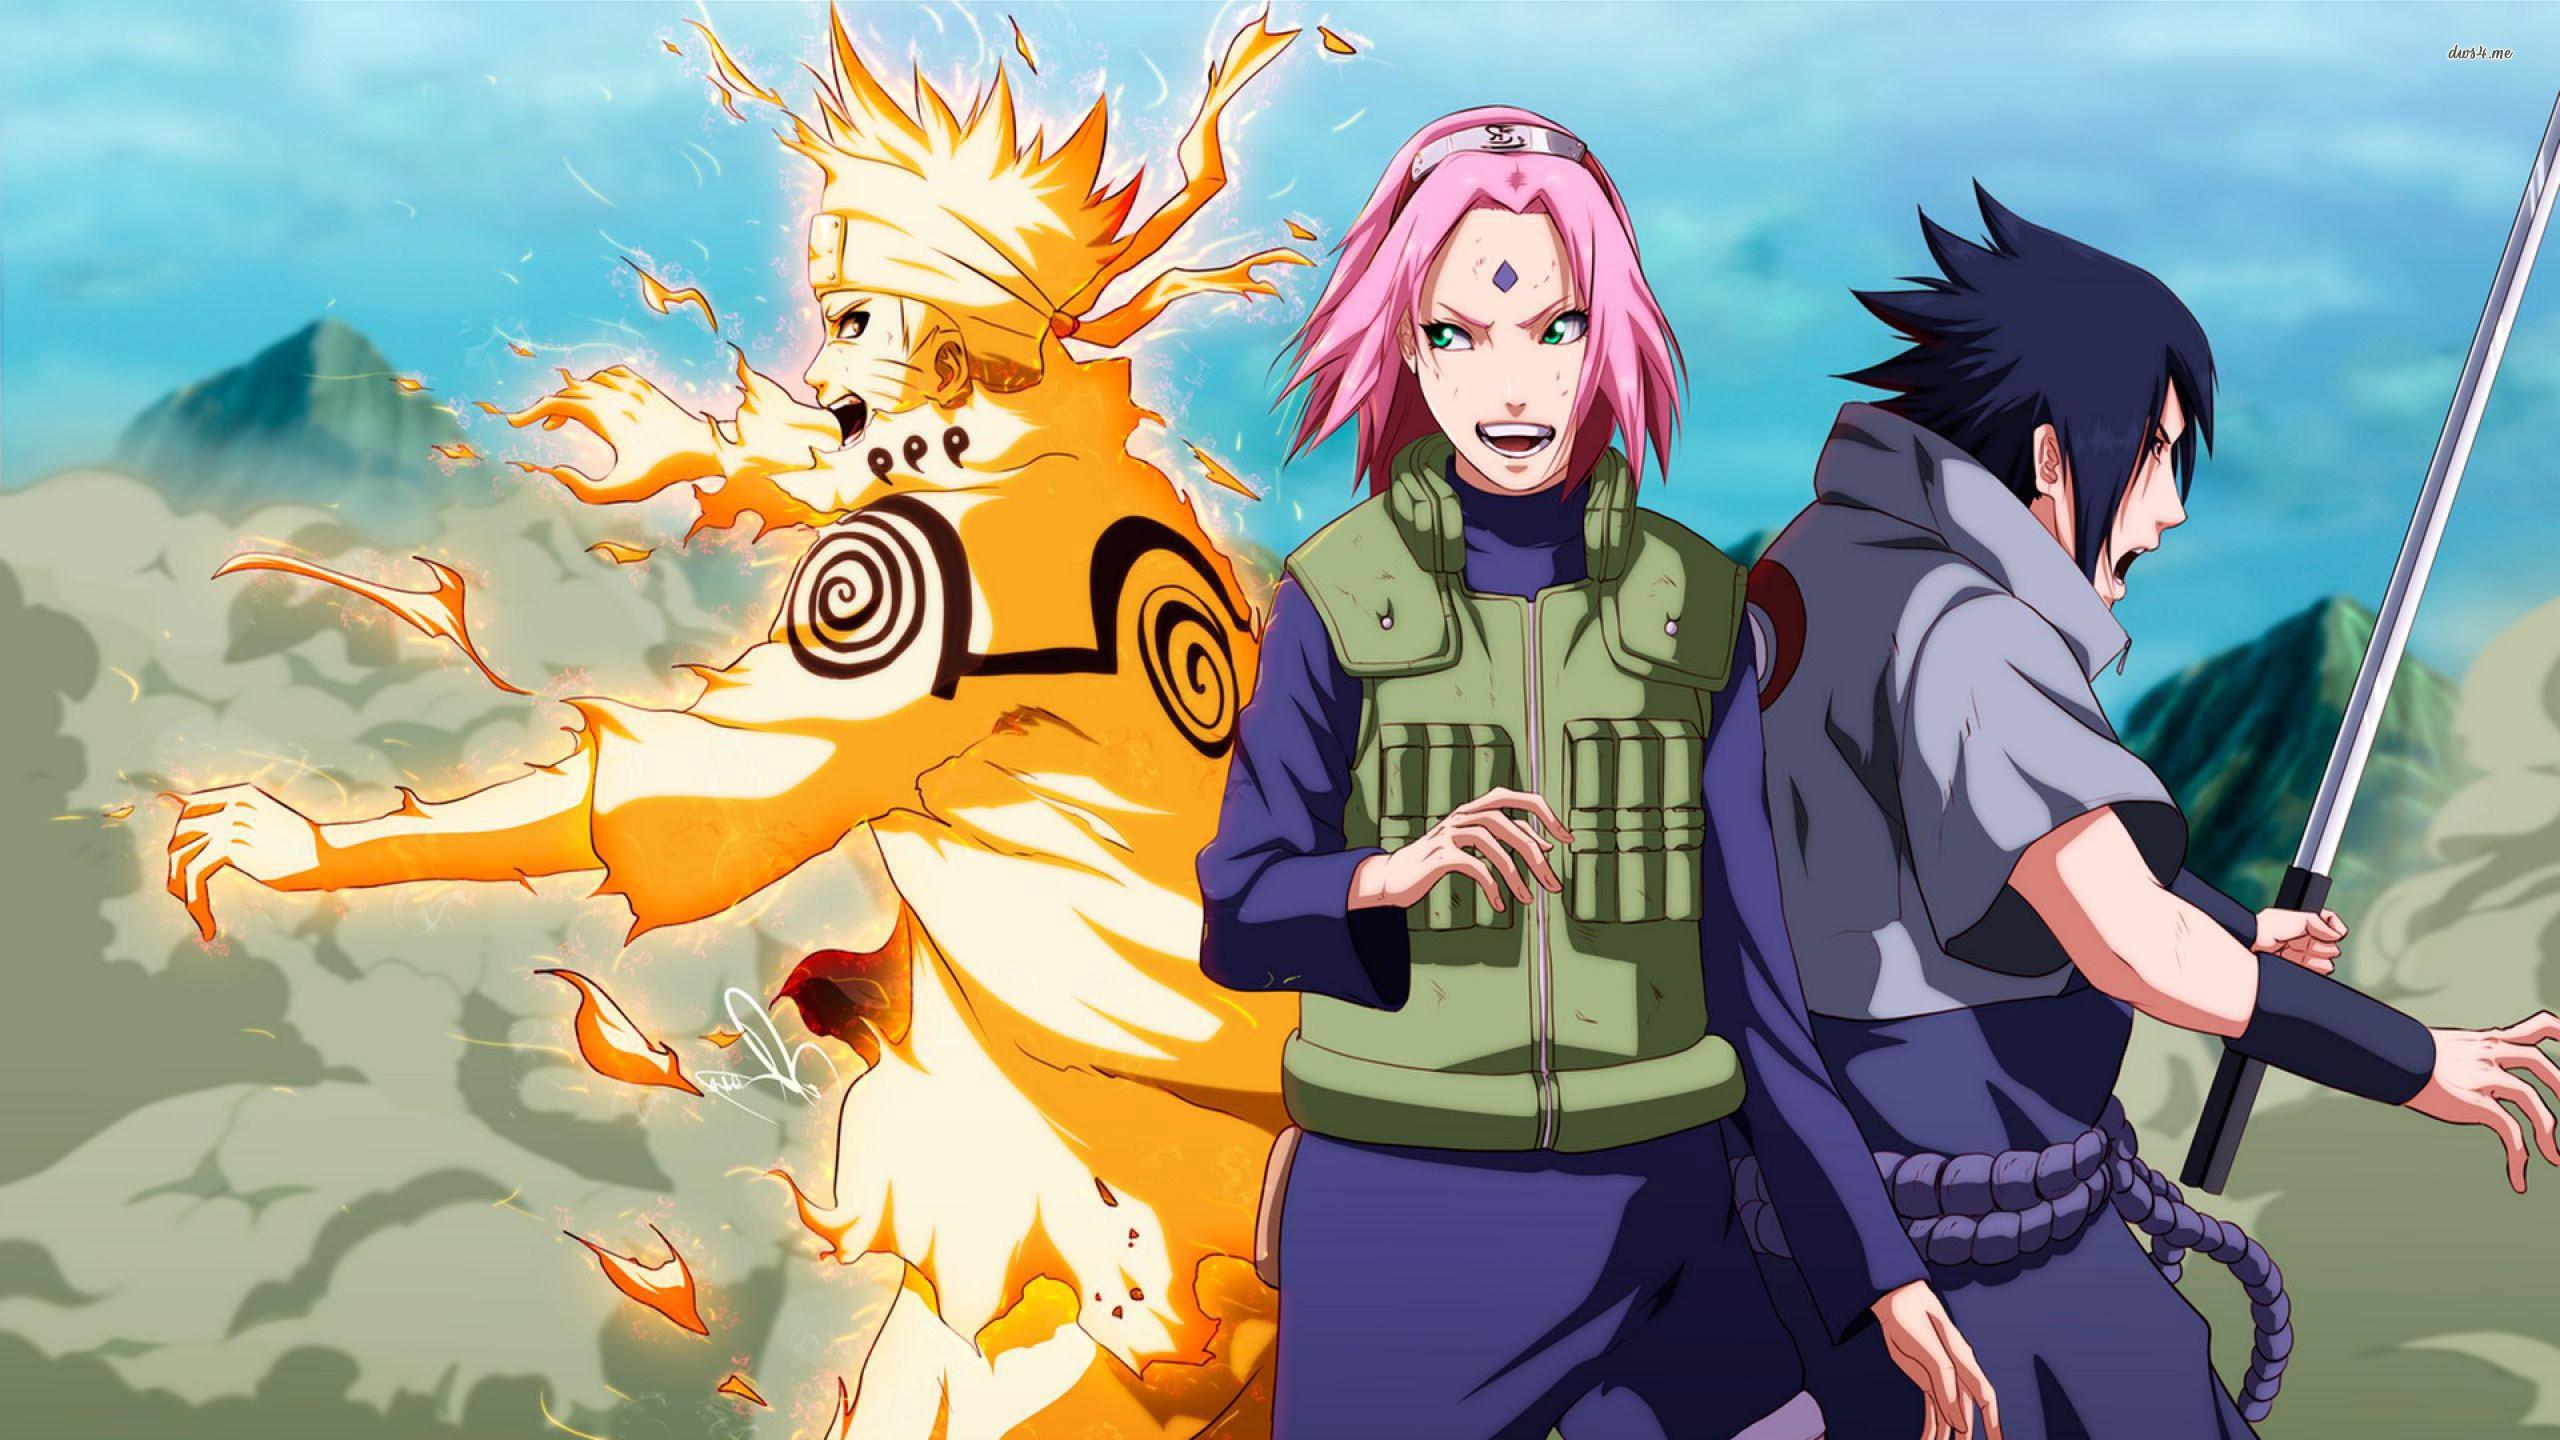 Wonderful Wallpaper Naruto Anime - 728733-wallpapers-de-naruto-shippuden-hd-2018-2560x1440-for-1080p  Collection_245594.jpg